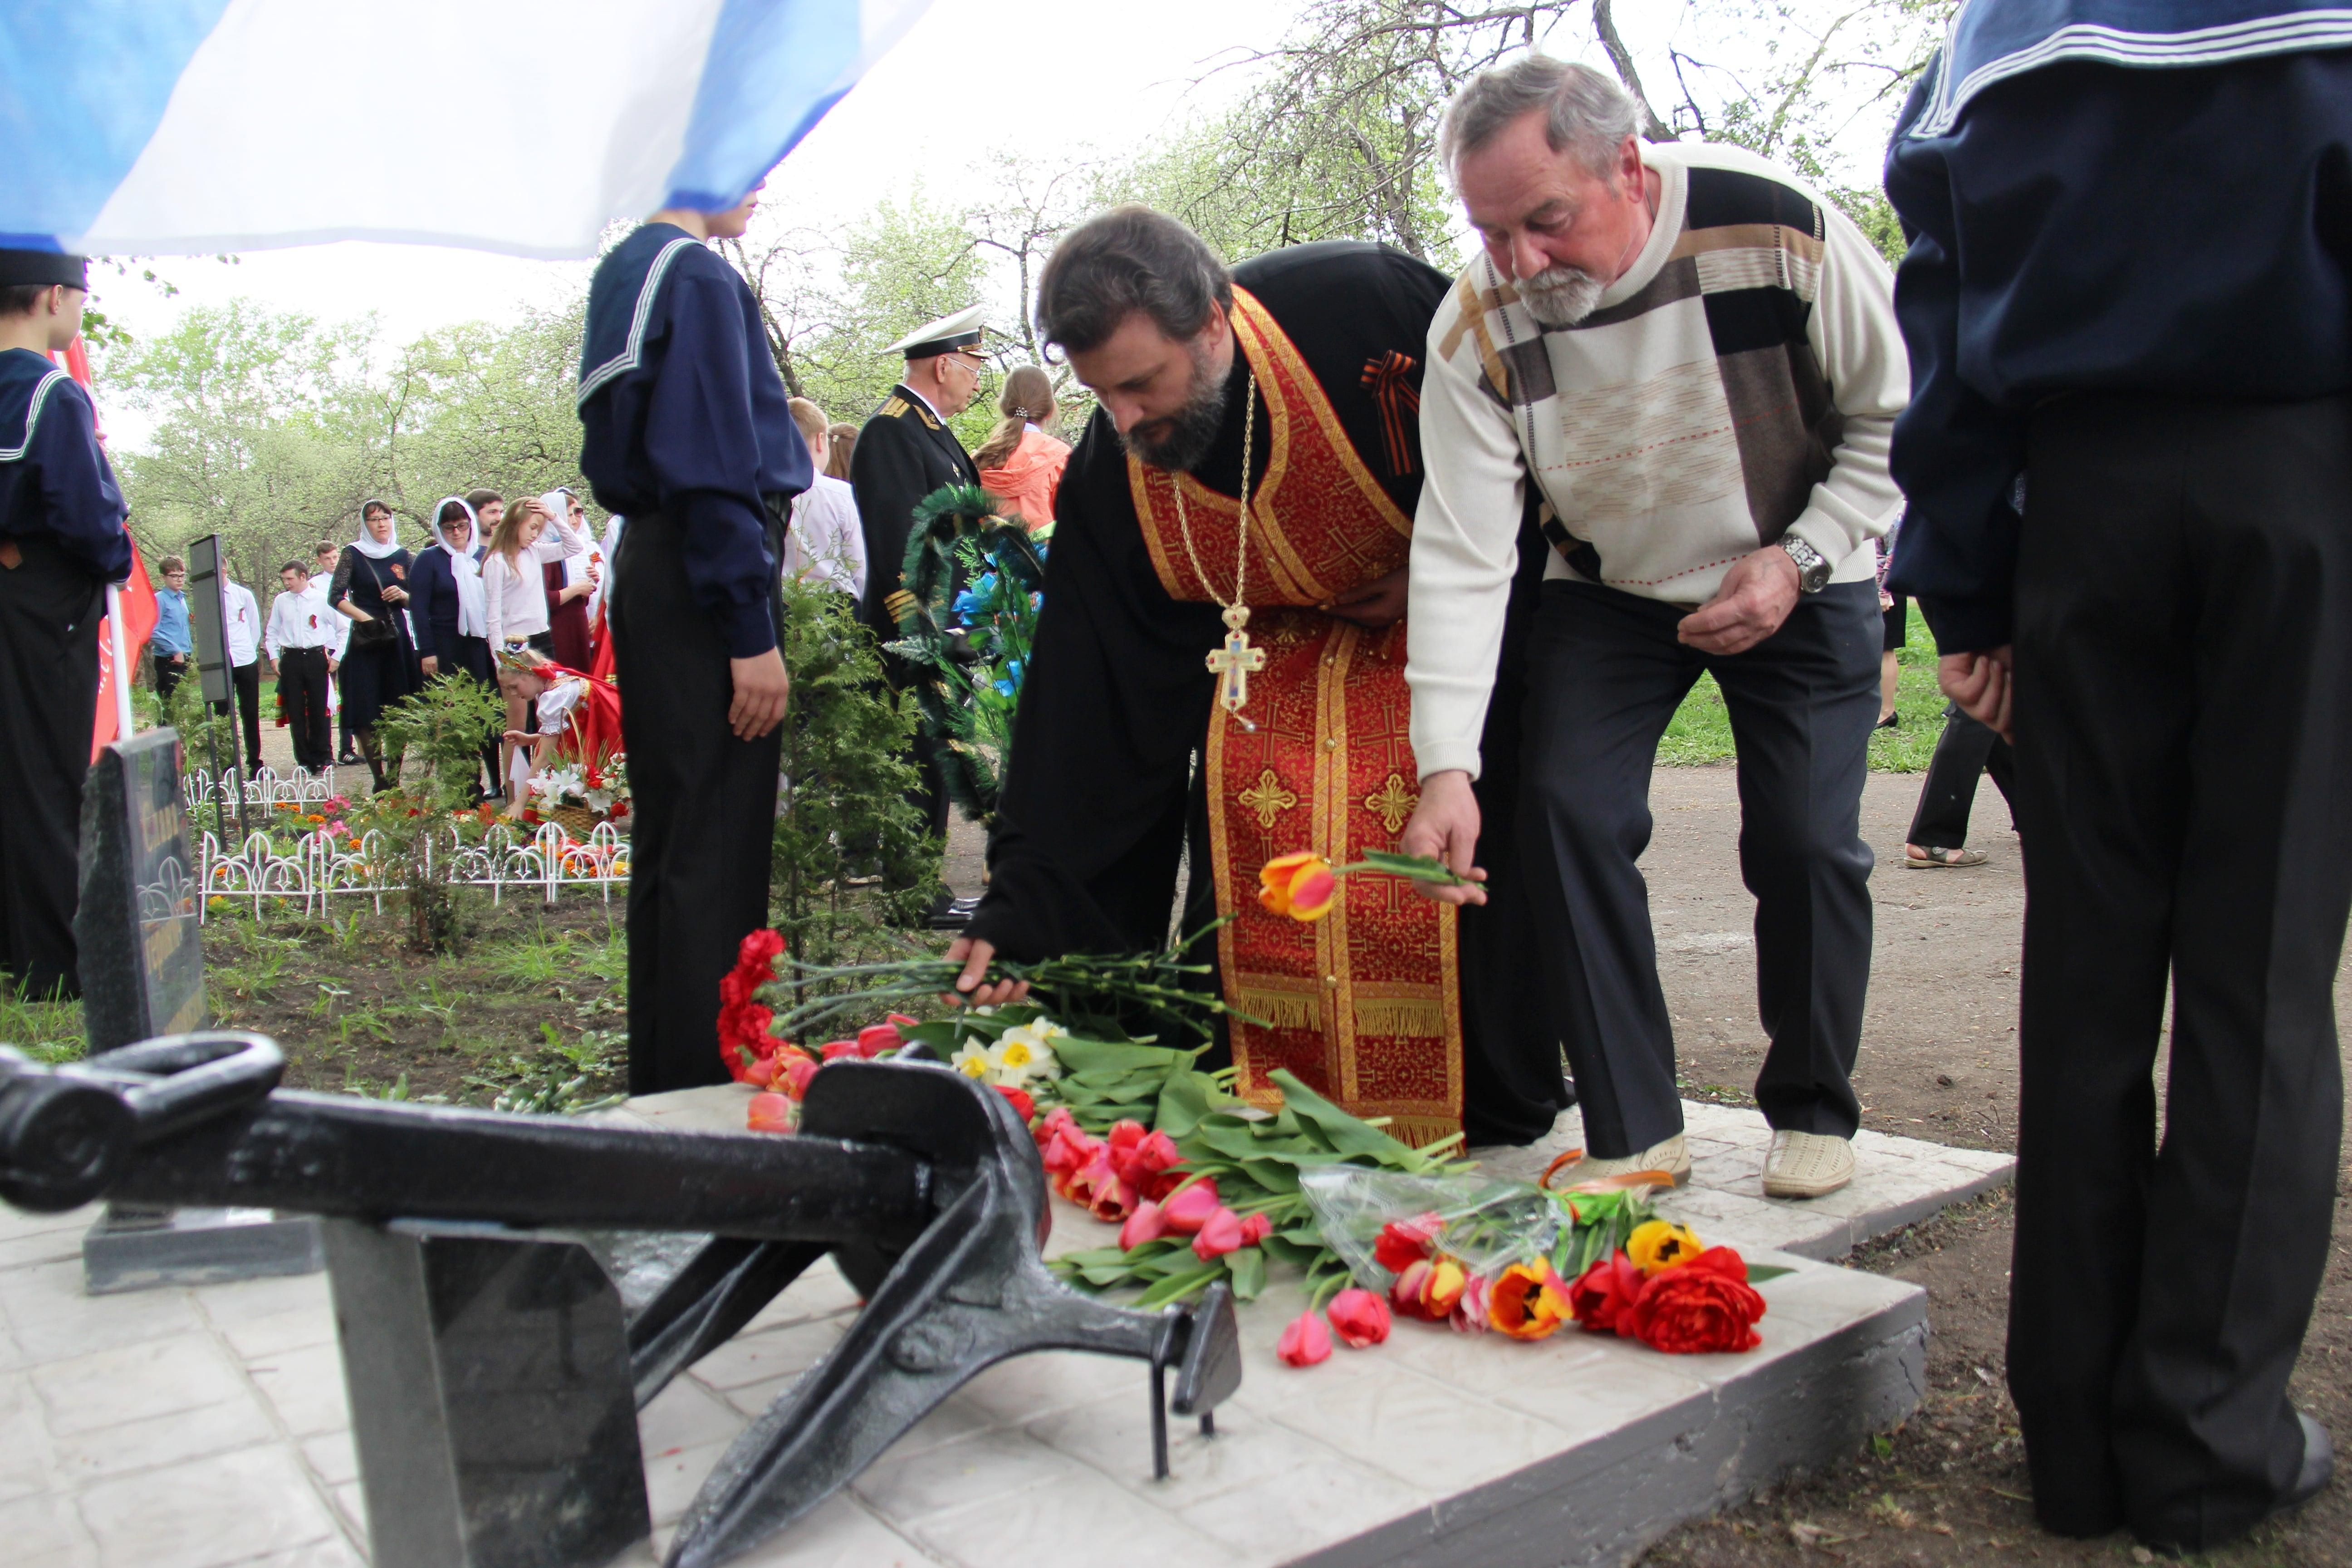 http://monuspen.ru/photoreports/b3afe9db7b5af7083492e2c5aff7c192.JPG